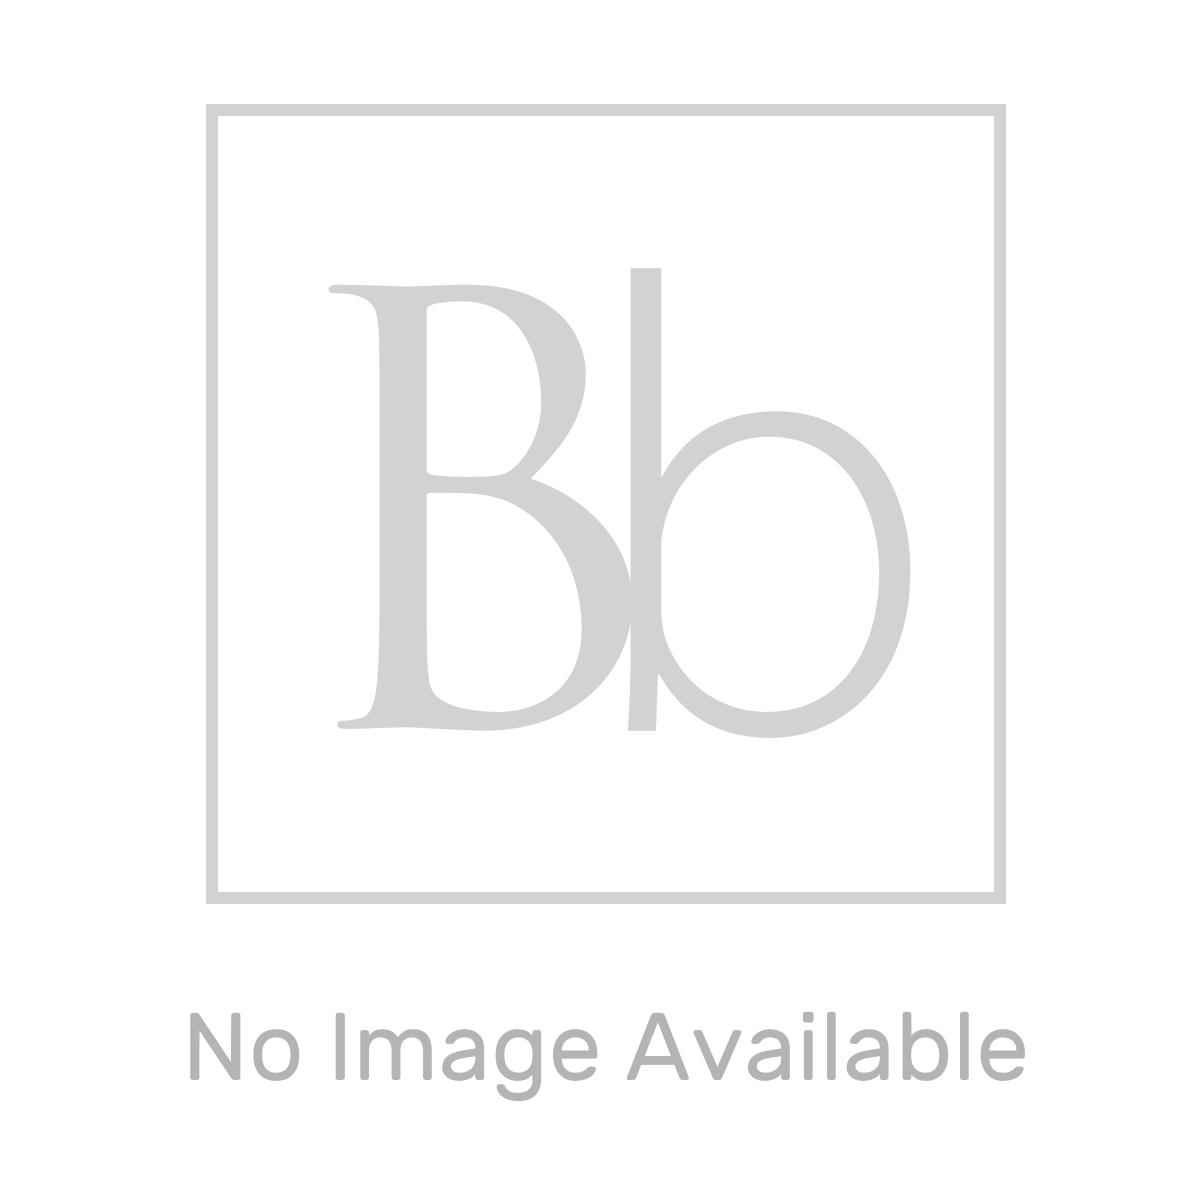 Croydex Rigid Wiper Bath Screen Seal Kit Detail